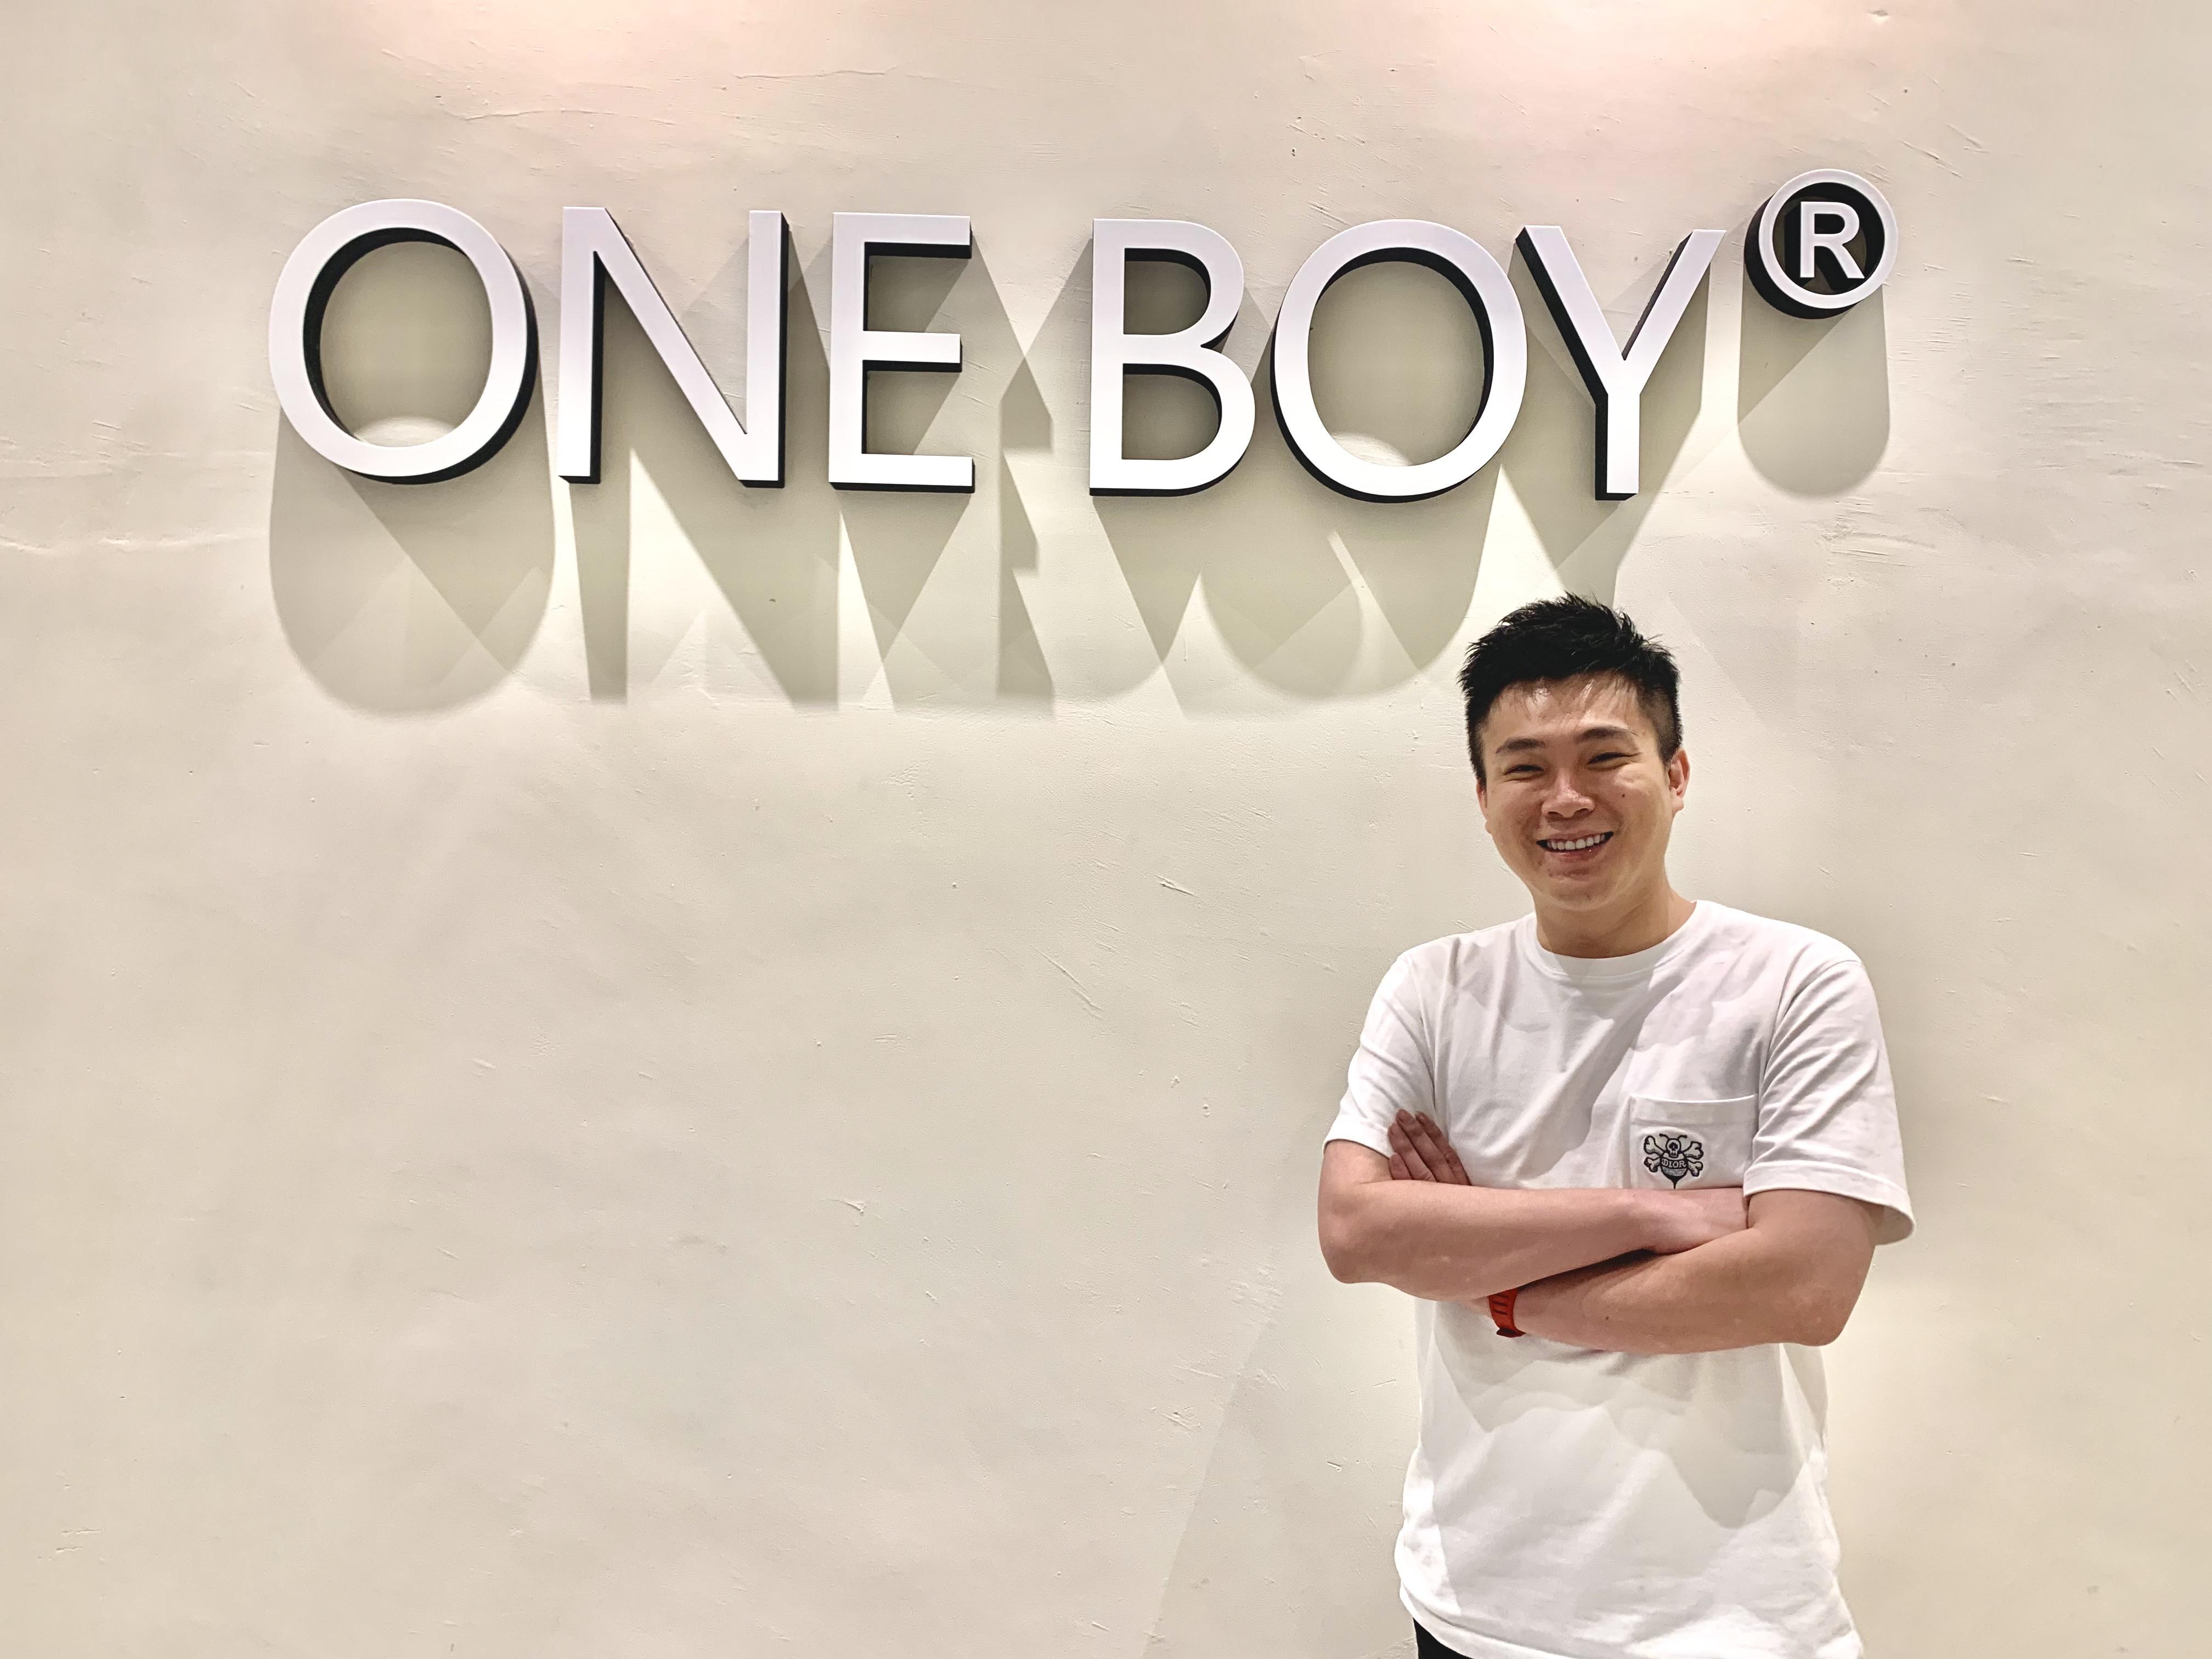 One Boy「一位大男孩」的起心動念  創辦人顏瑋廷:做屬於自己的事